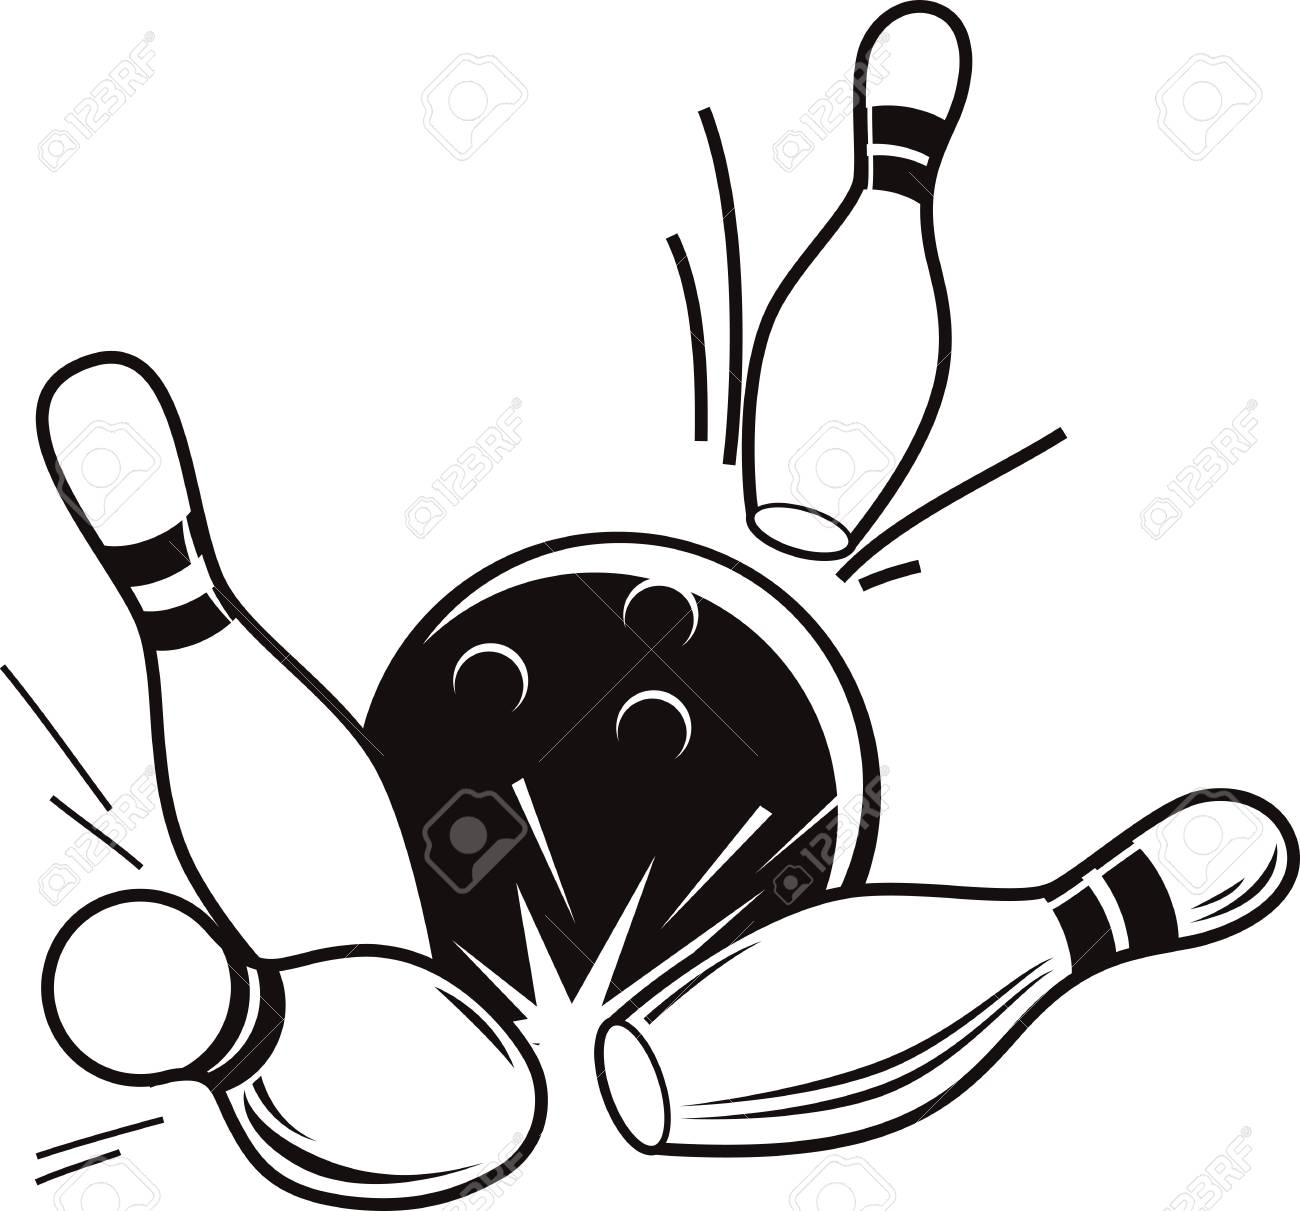 Bowling Alley Drawing At Getdrawings